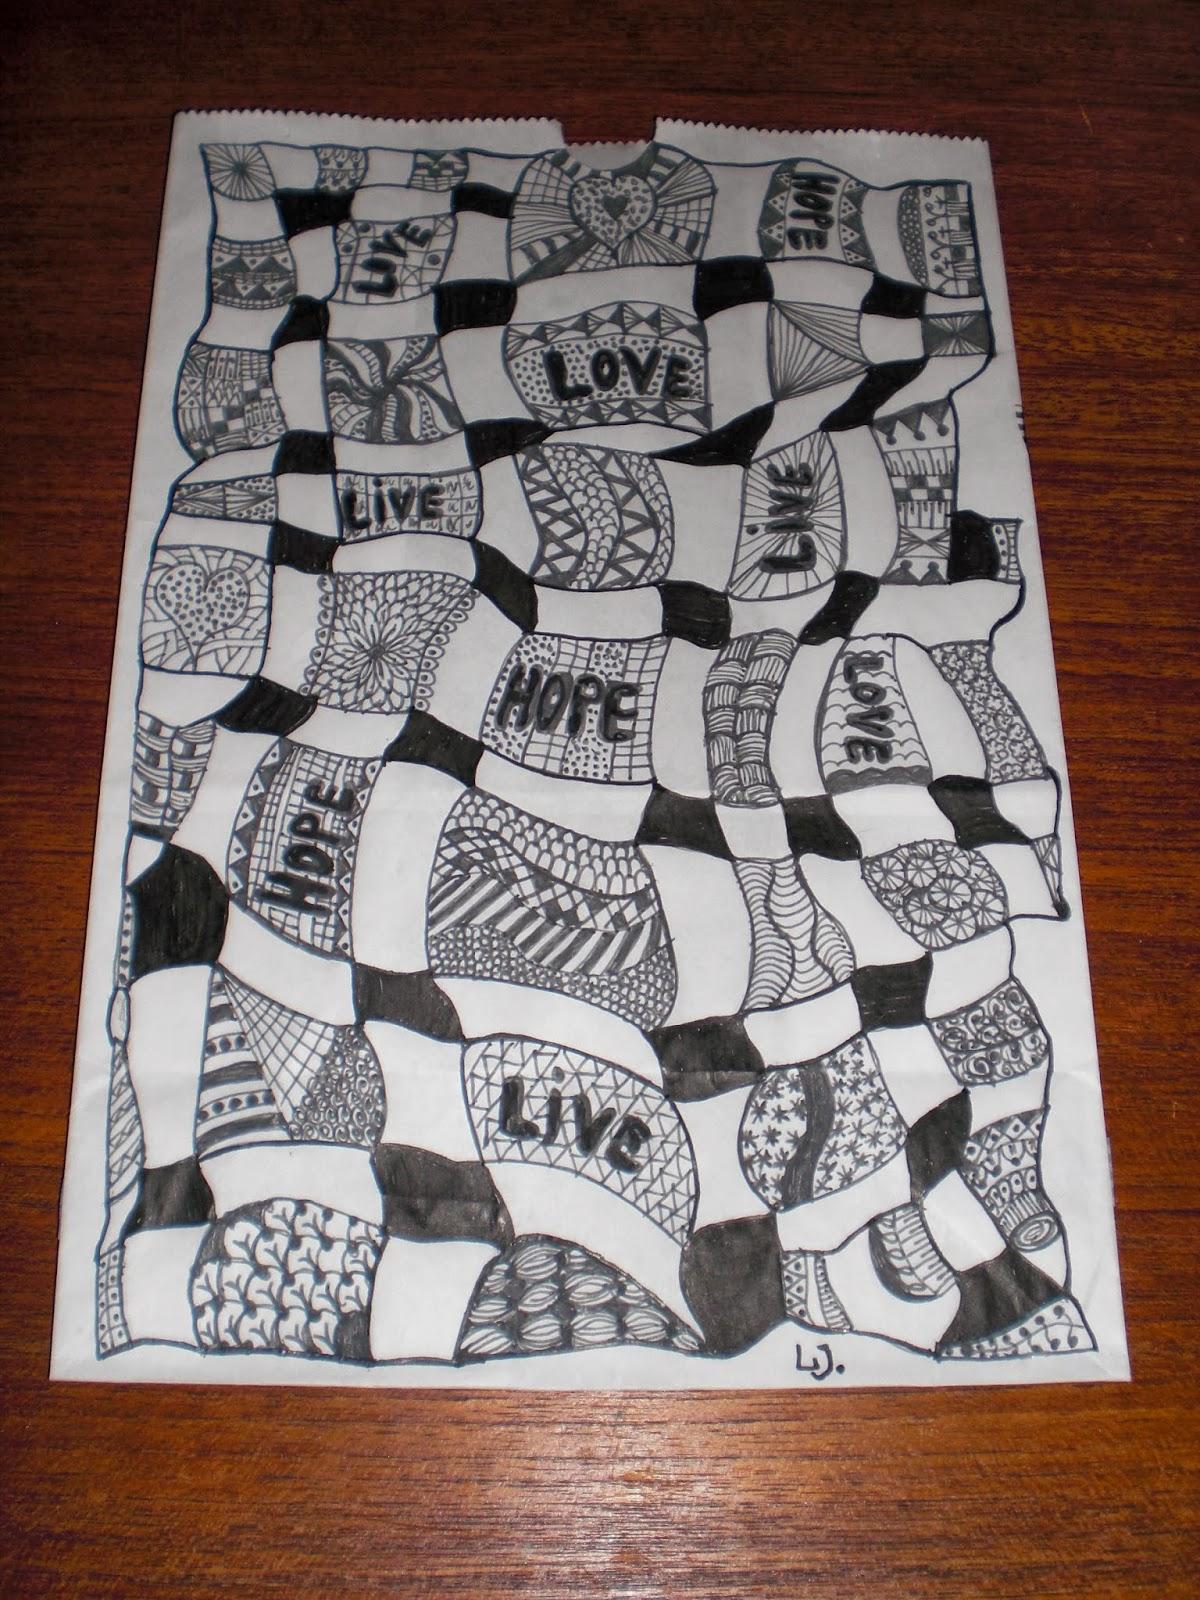 Zentangle kruseduller tegnet på lysposer til Kræftens Bekæmpelse